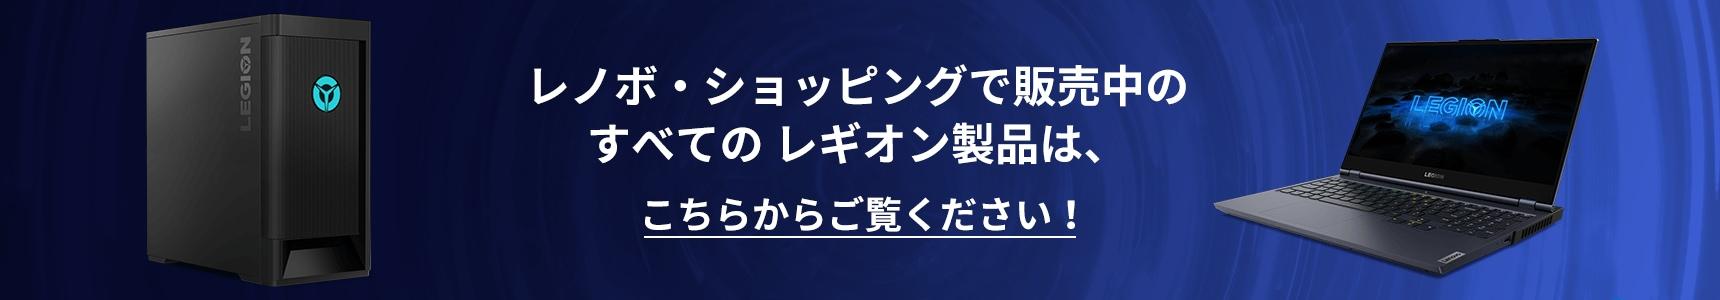 lenovo-jp-xbox-gaming-banner-pc